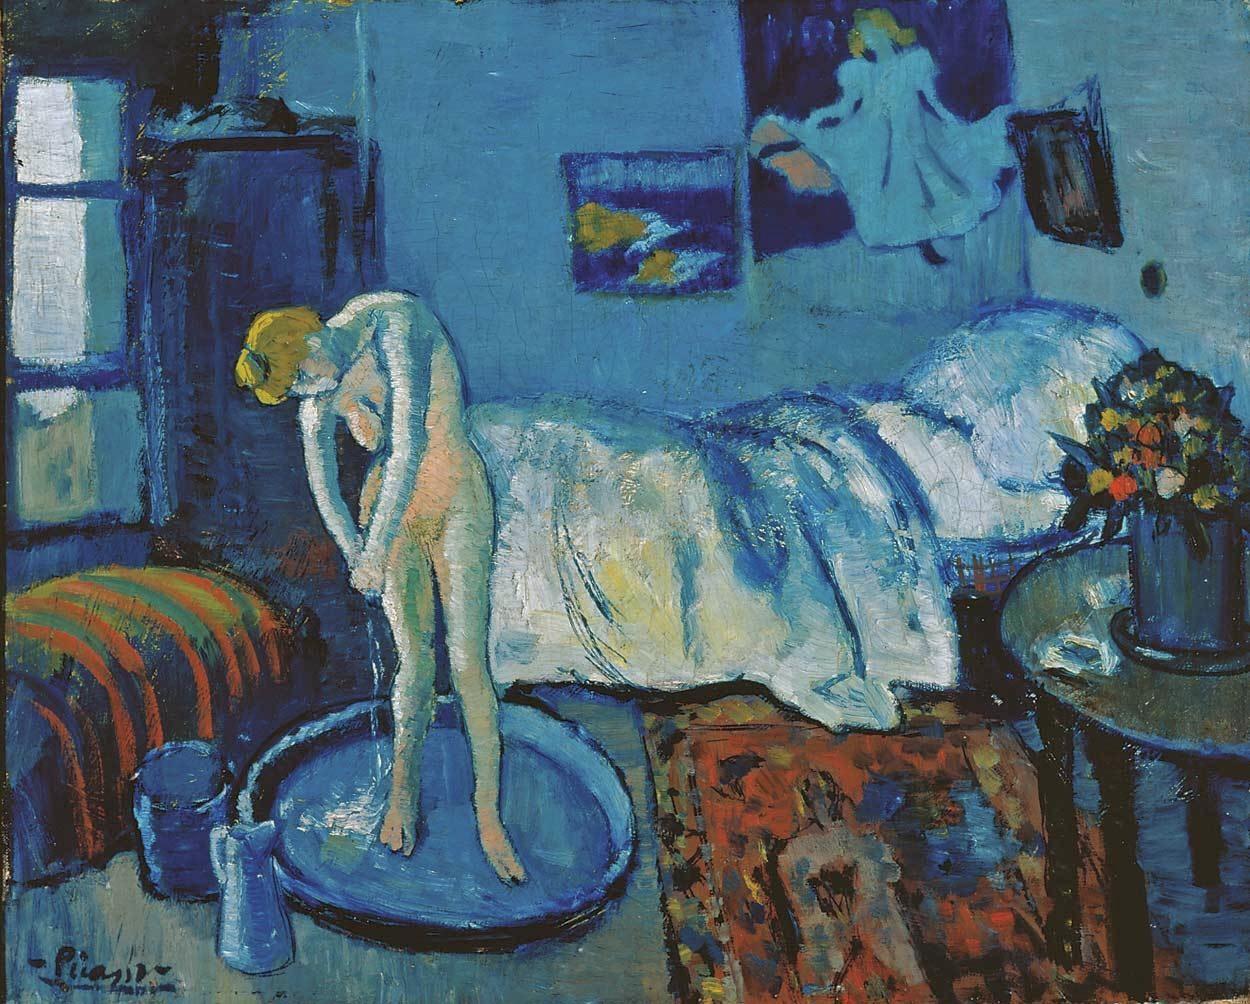 Синяя комната (Пикассо) — Википедия